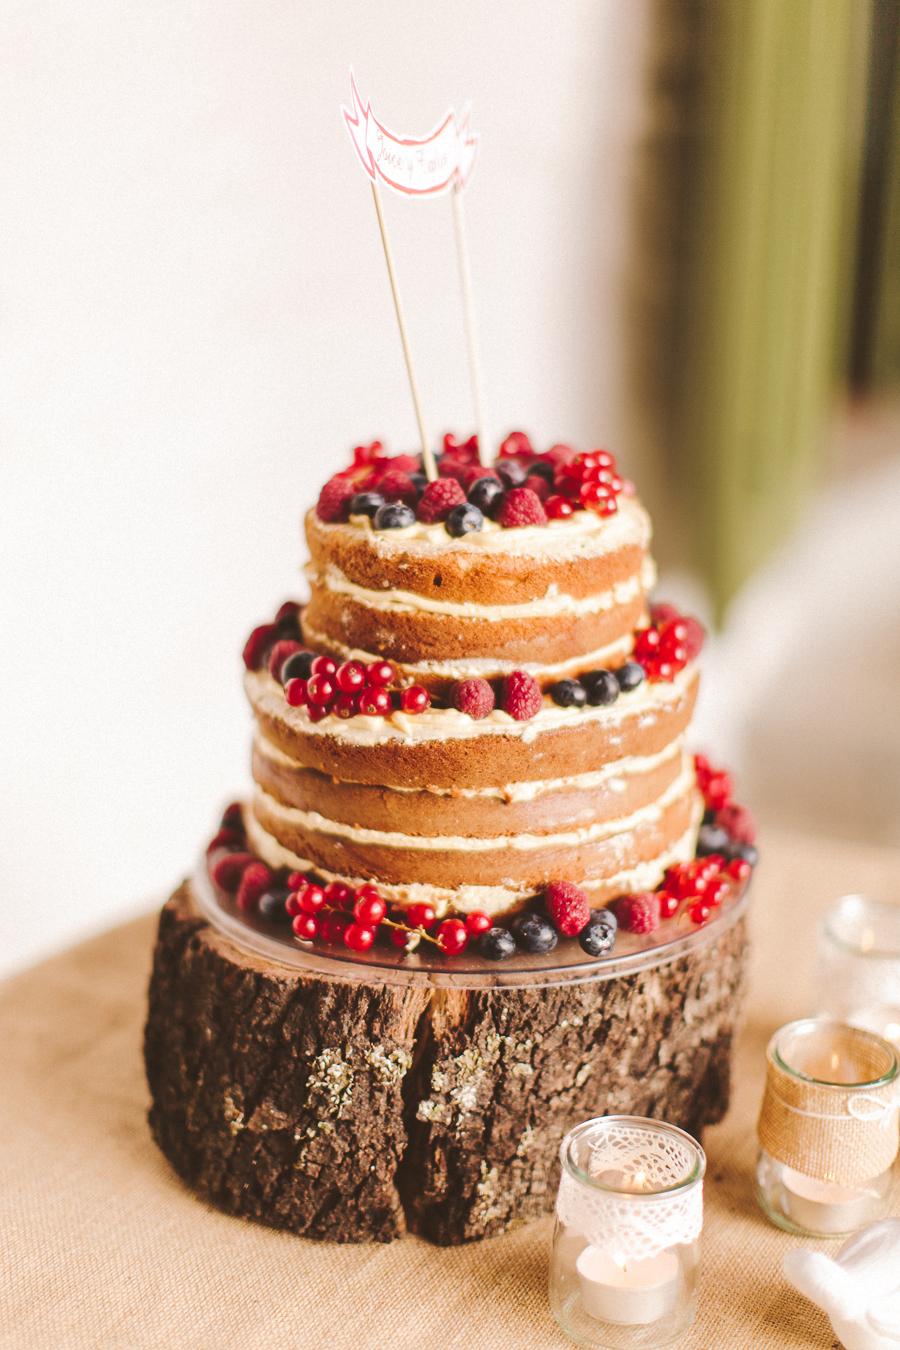 joice y carlos, tarta